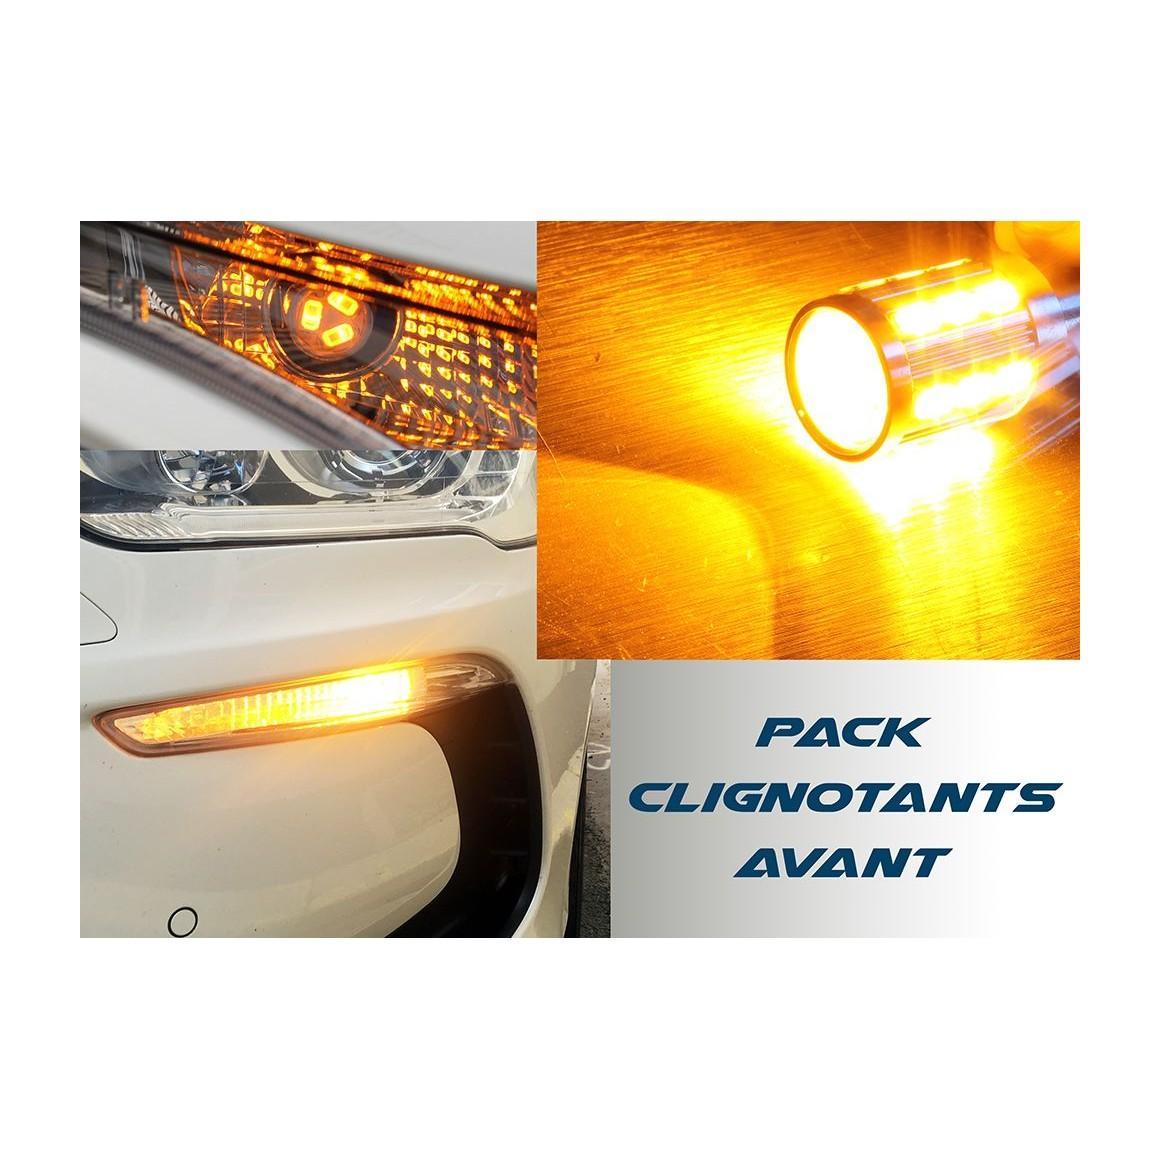 Pack Clignotant AVANT LED pour SUZUKI Jimny